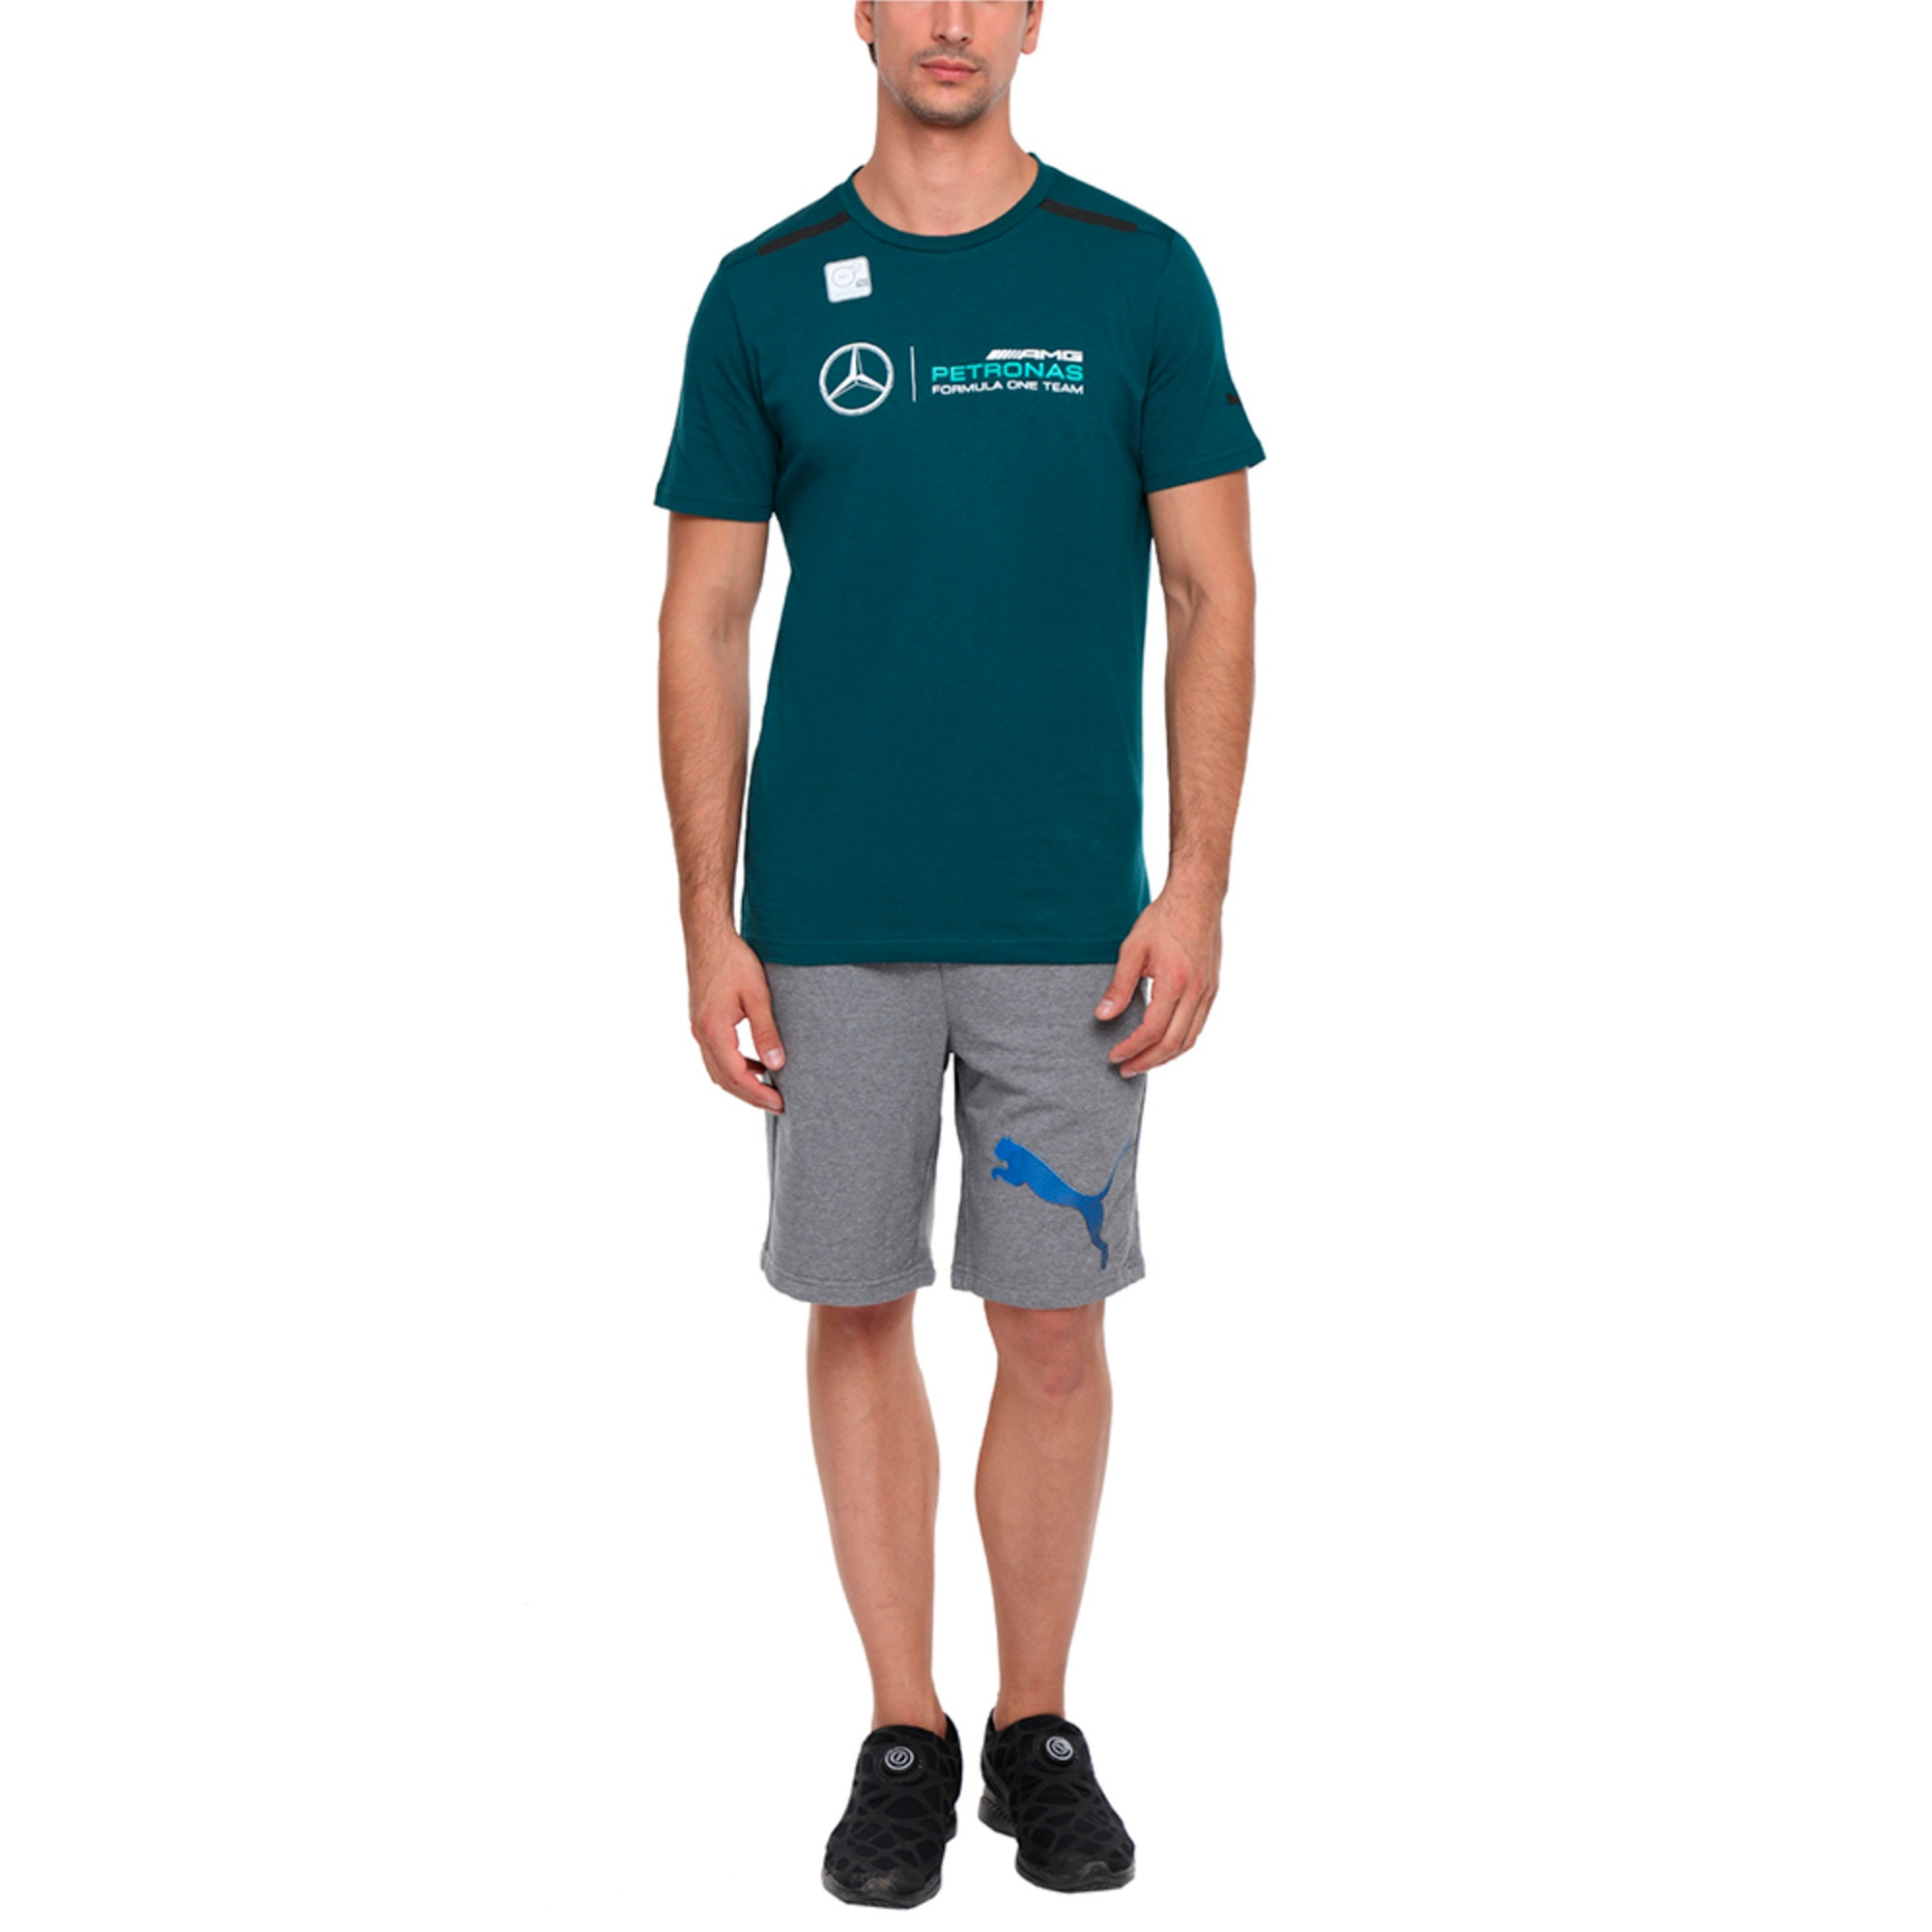 Thumbnail 4 of MERCEDES AMG PETRONAS Men's Logo T-Shirt, Deep Teal, medium-IND